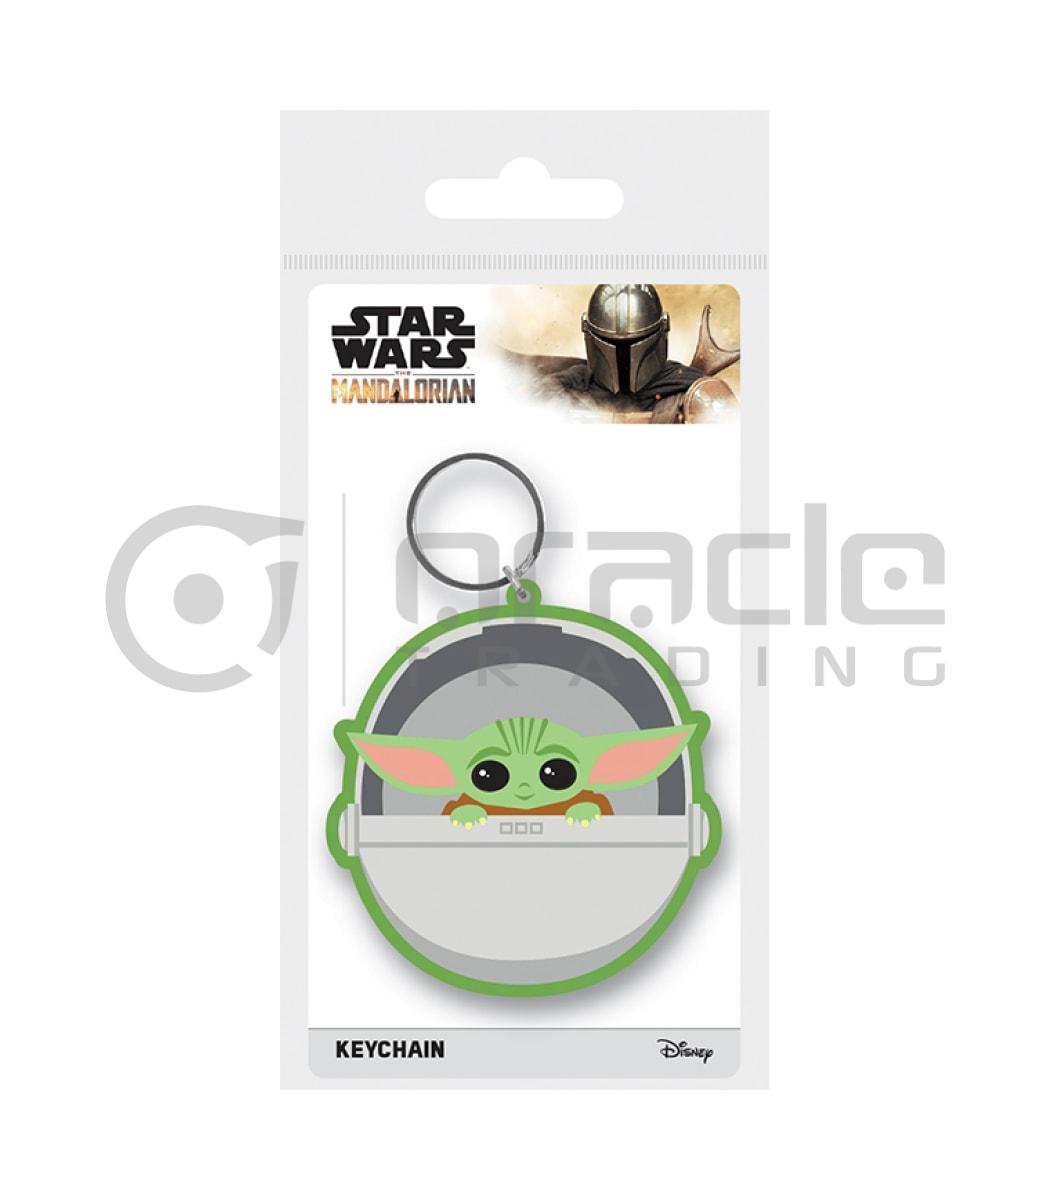 Star Wars: The Mandalorian Keychain - The Child